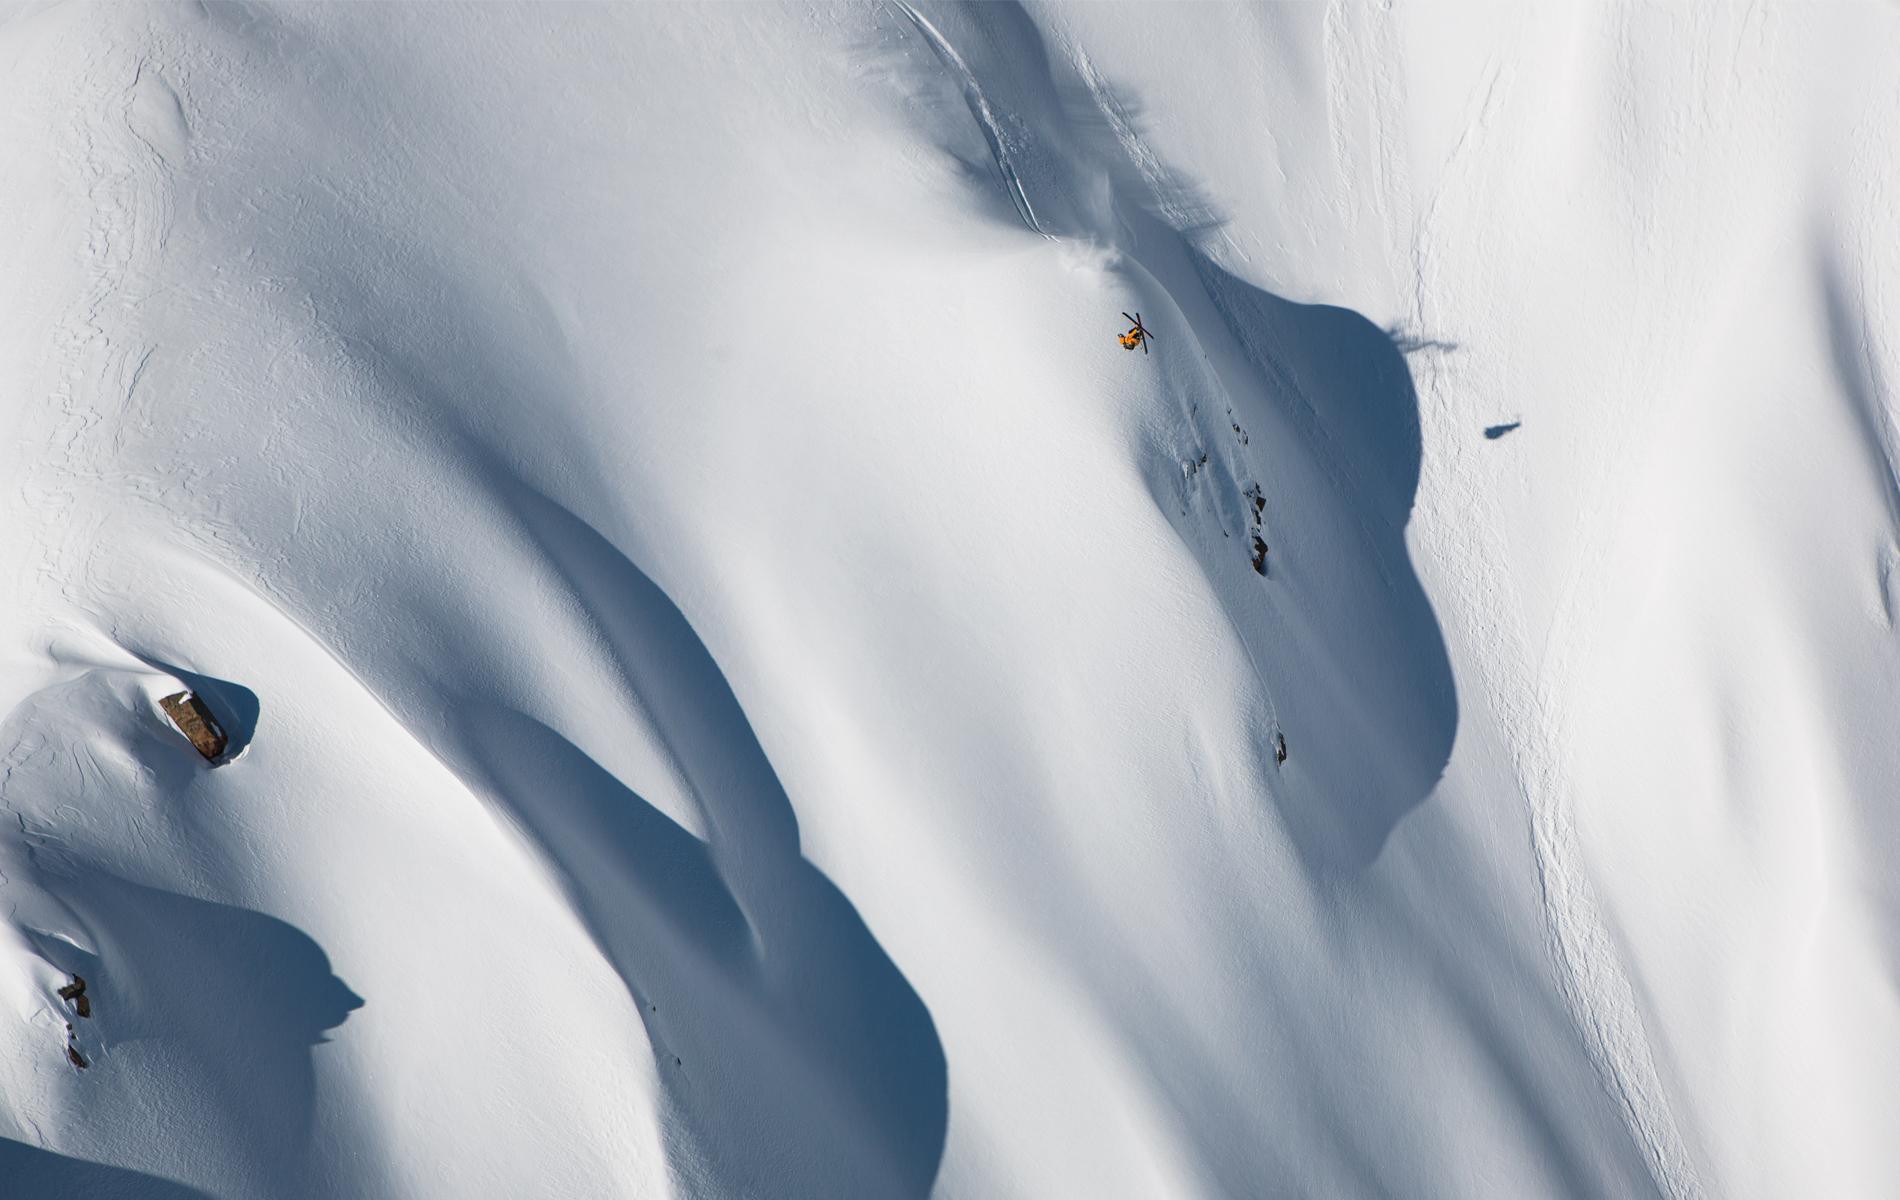 Athlete Sam Anthamatten gets inverted on his 1,300-foot descent of Mt. Ushba.